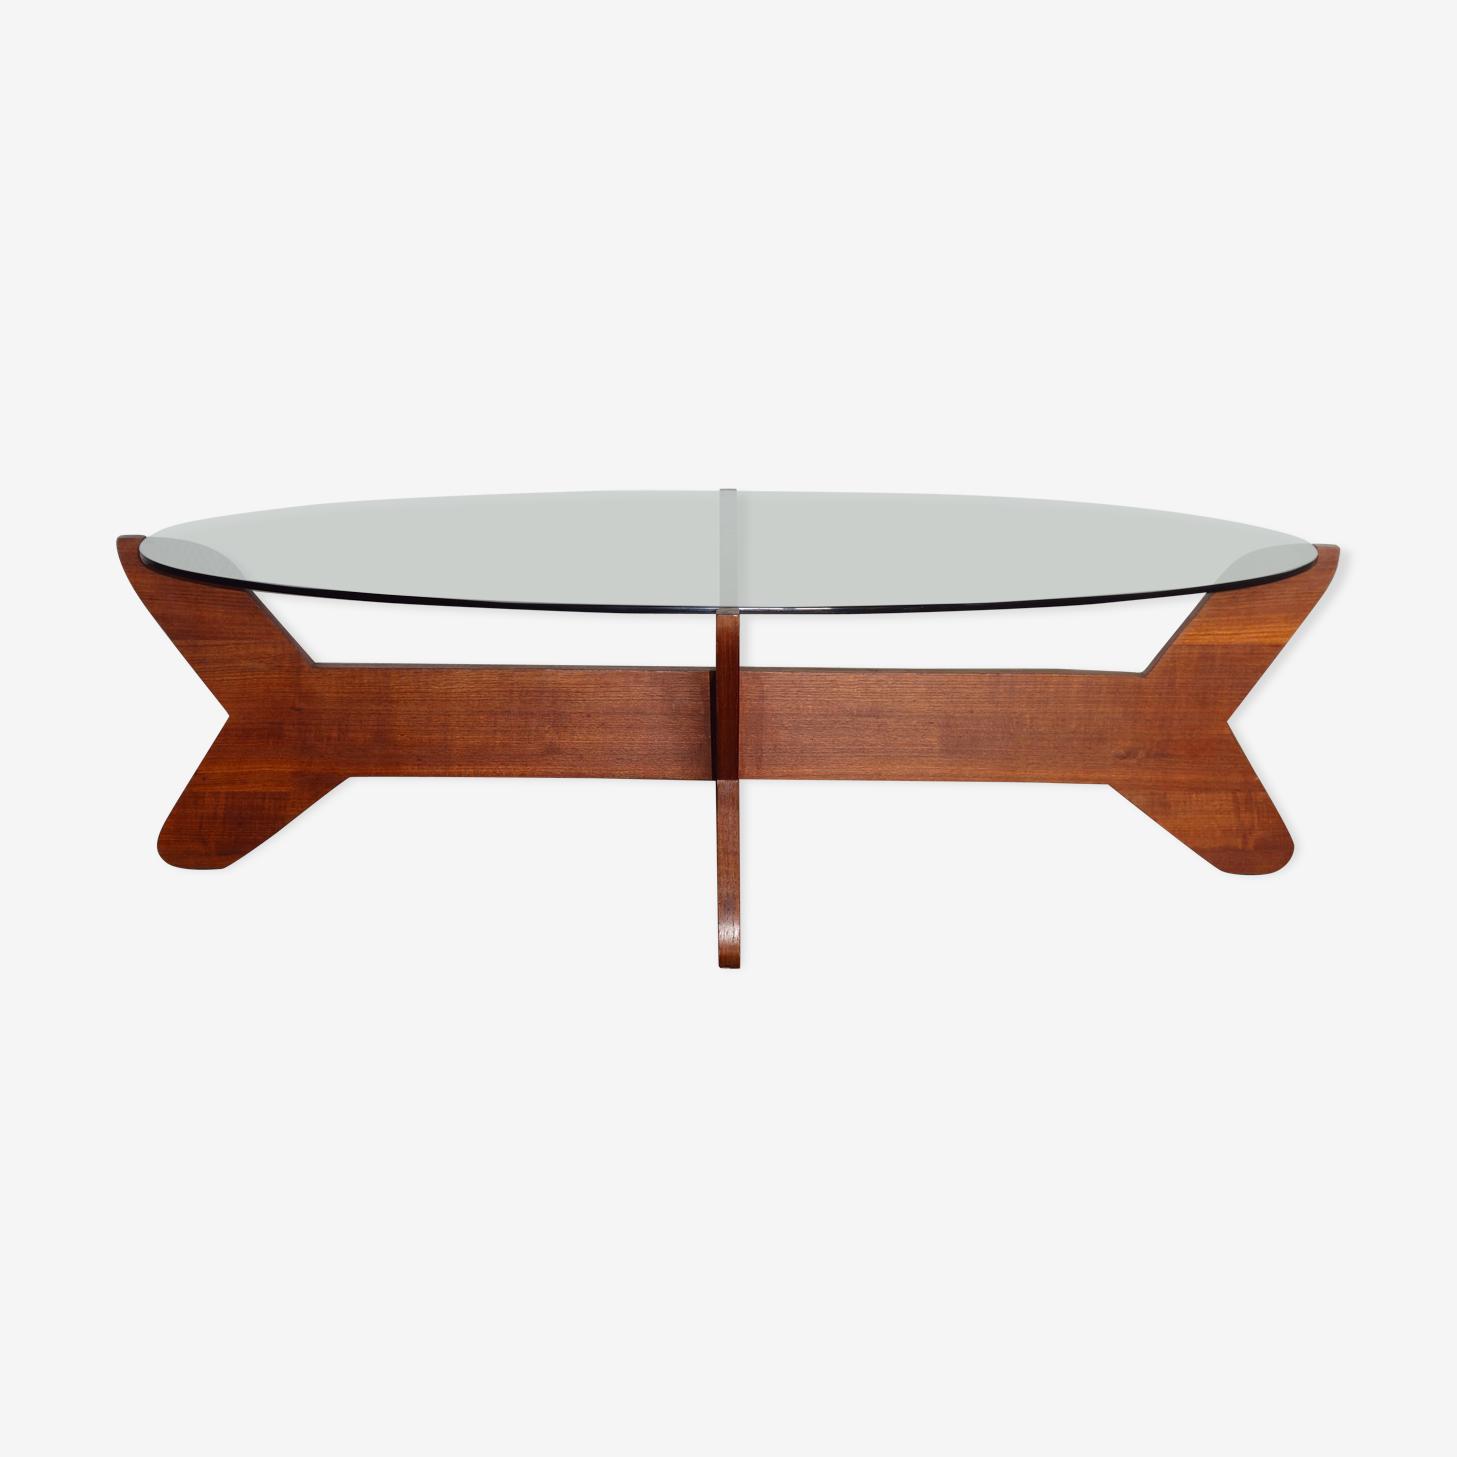 Teak oval coffee table 1960 years